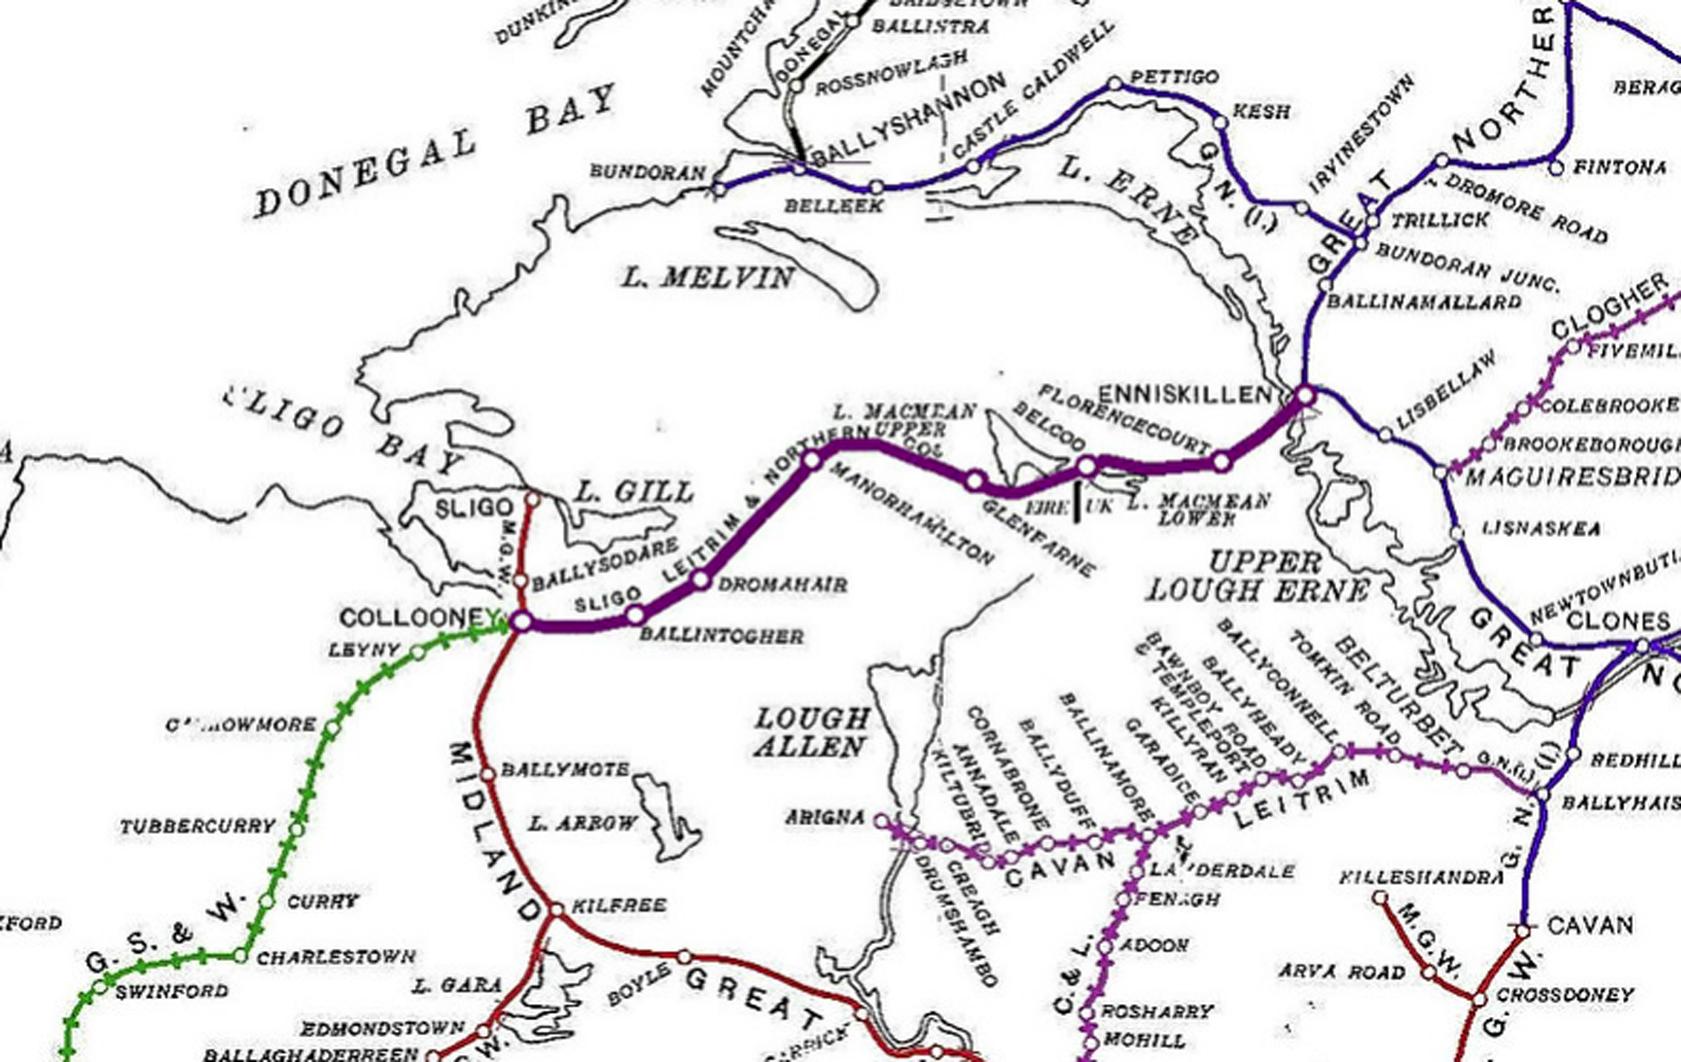 SligoLeitrimmap